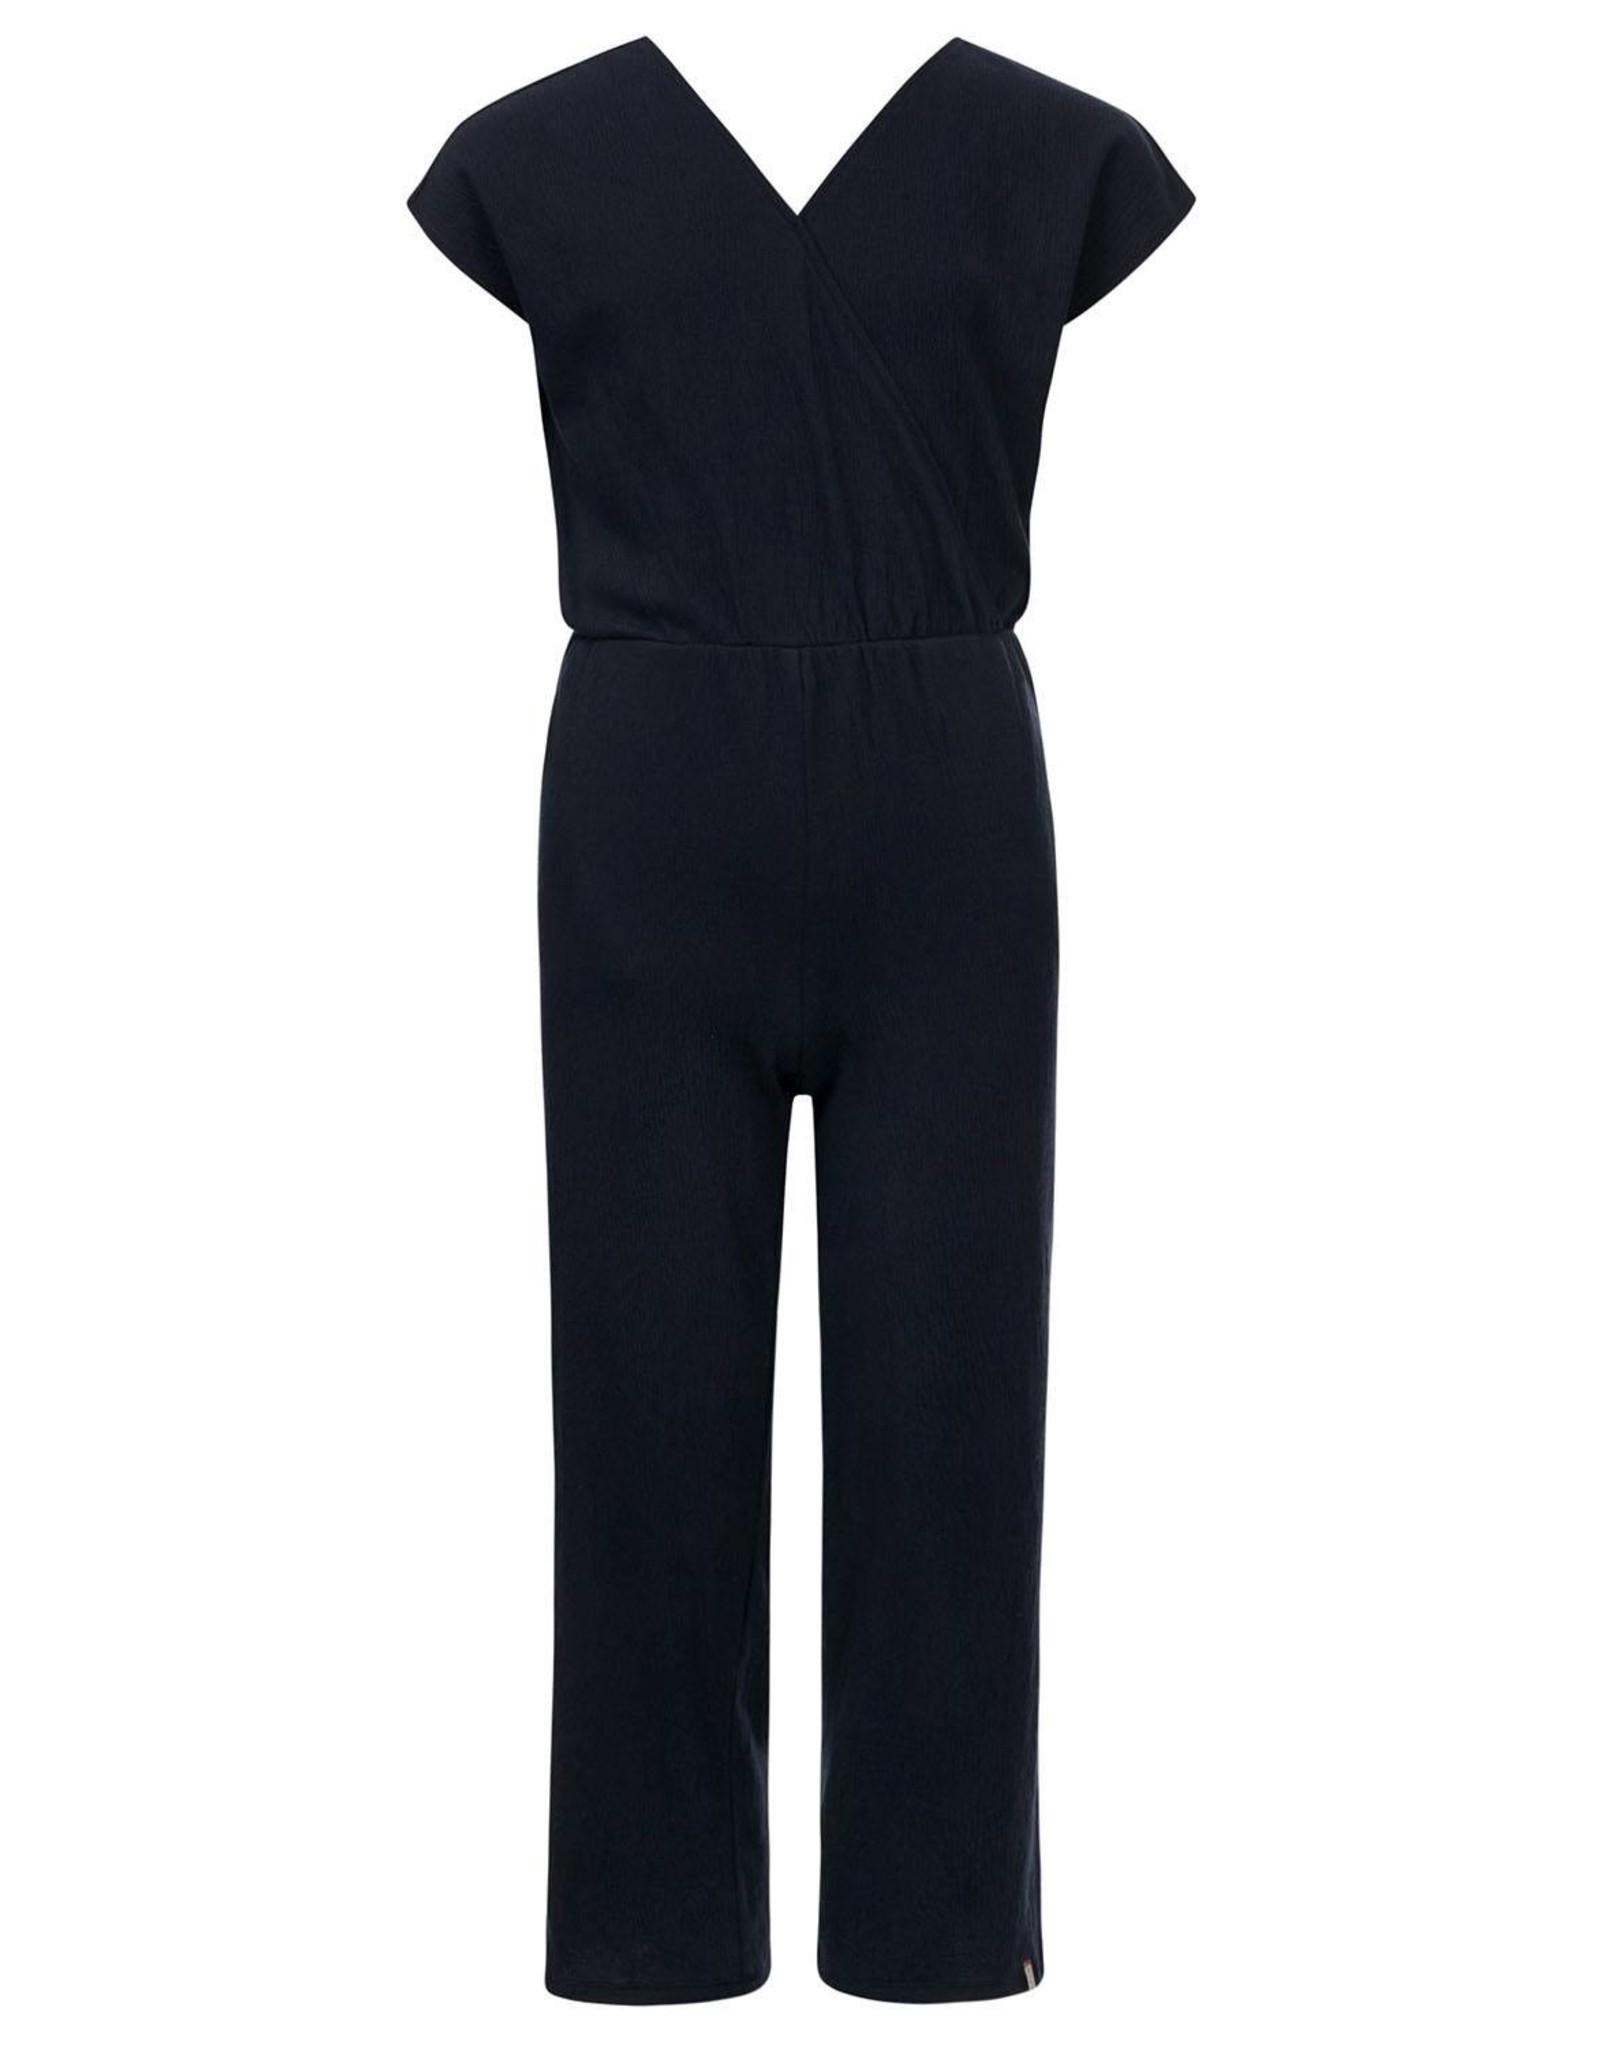 Looxs 10SIXTEEN 10Sixteen Jumpsuit blue